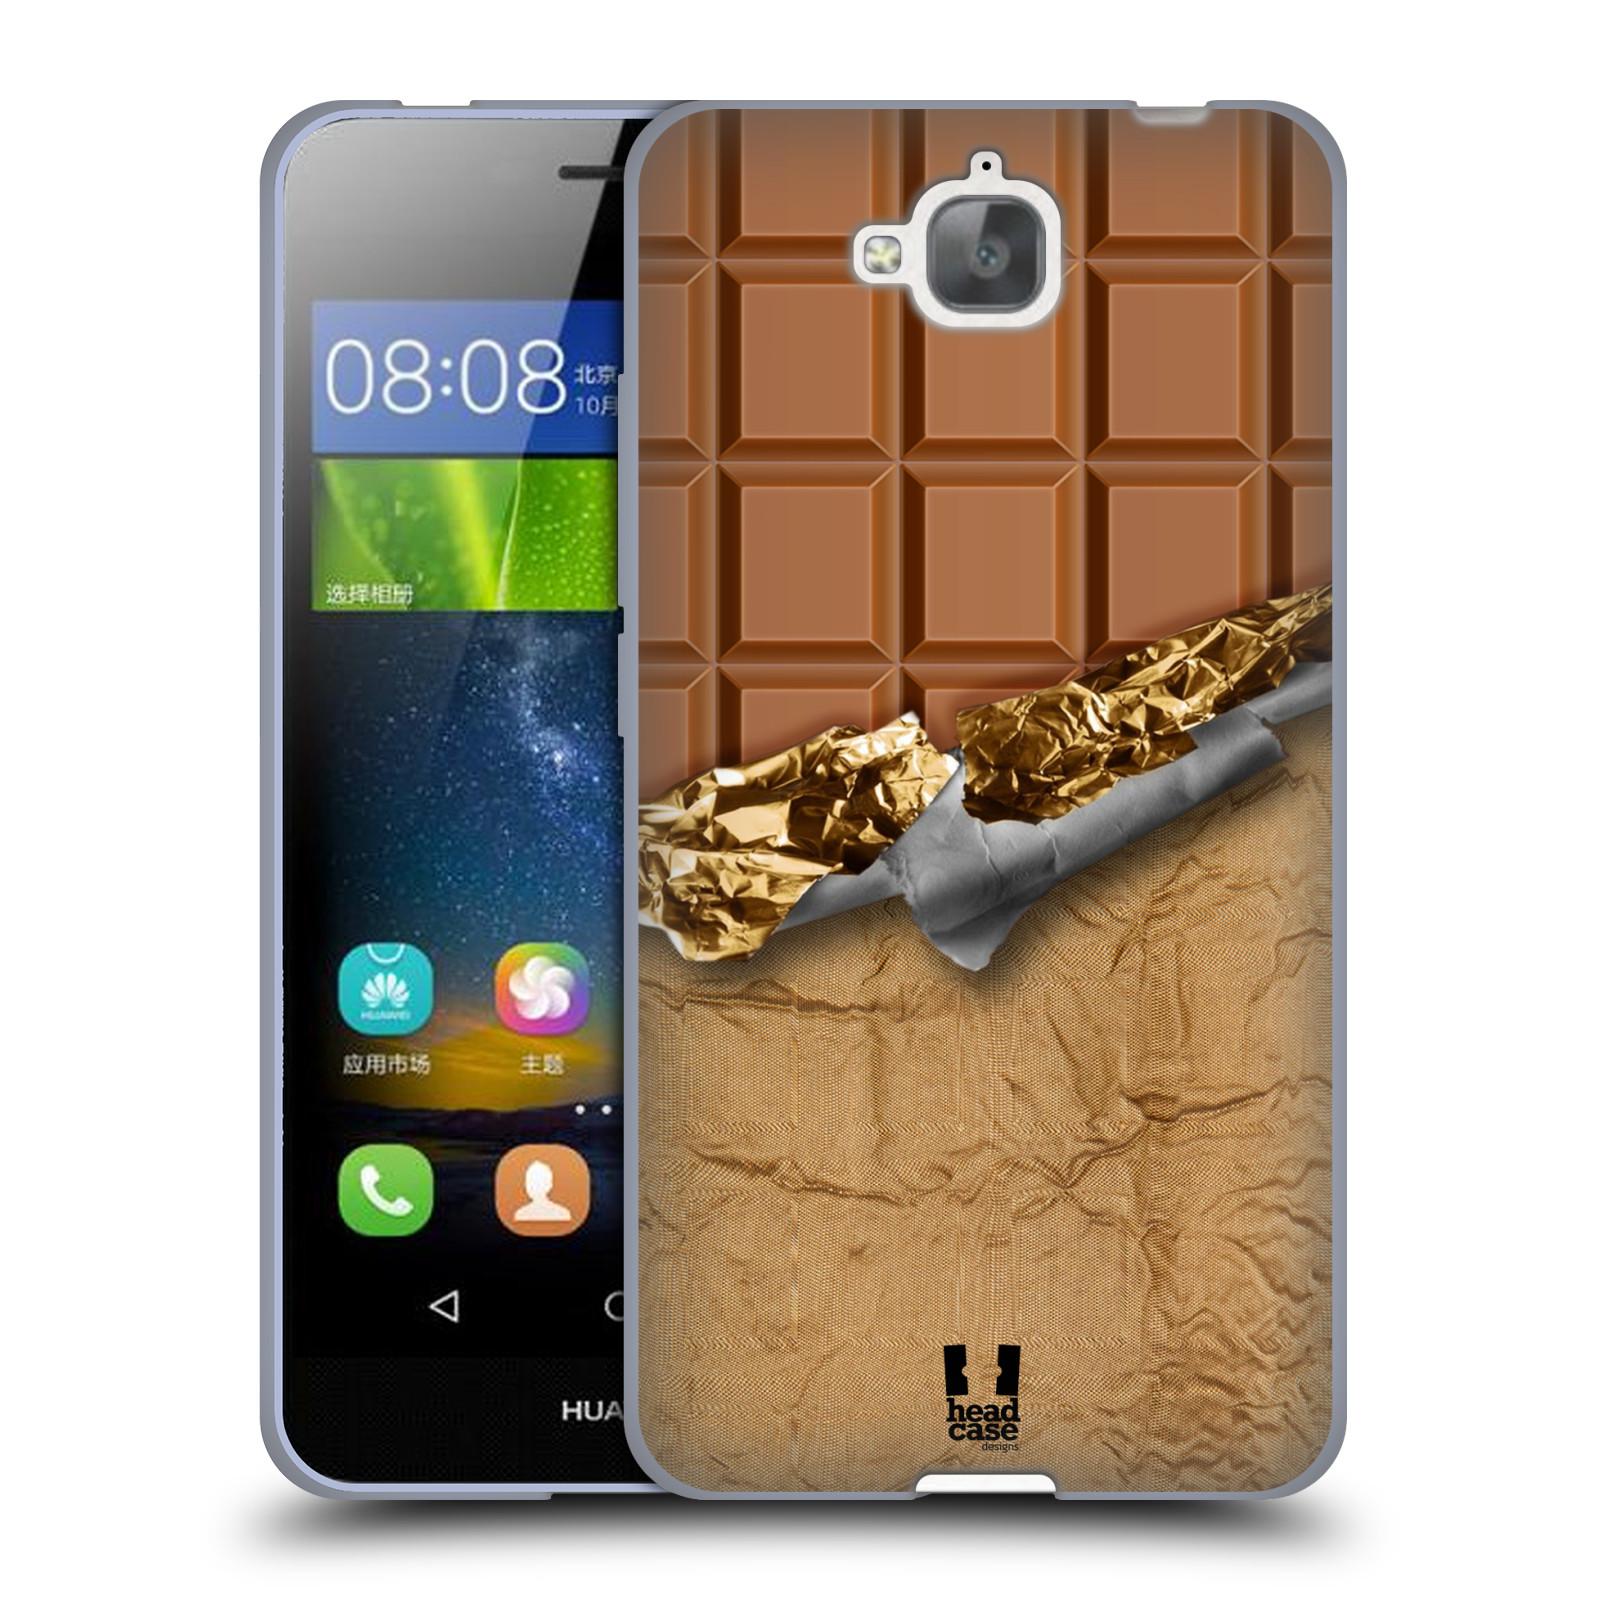 Silikonové pouzdro na mobil Huawei Y6 Pro Dual Sim HEAD CASE ČOKOFOILED